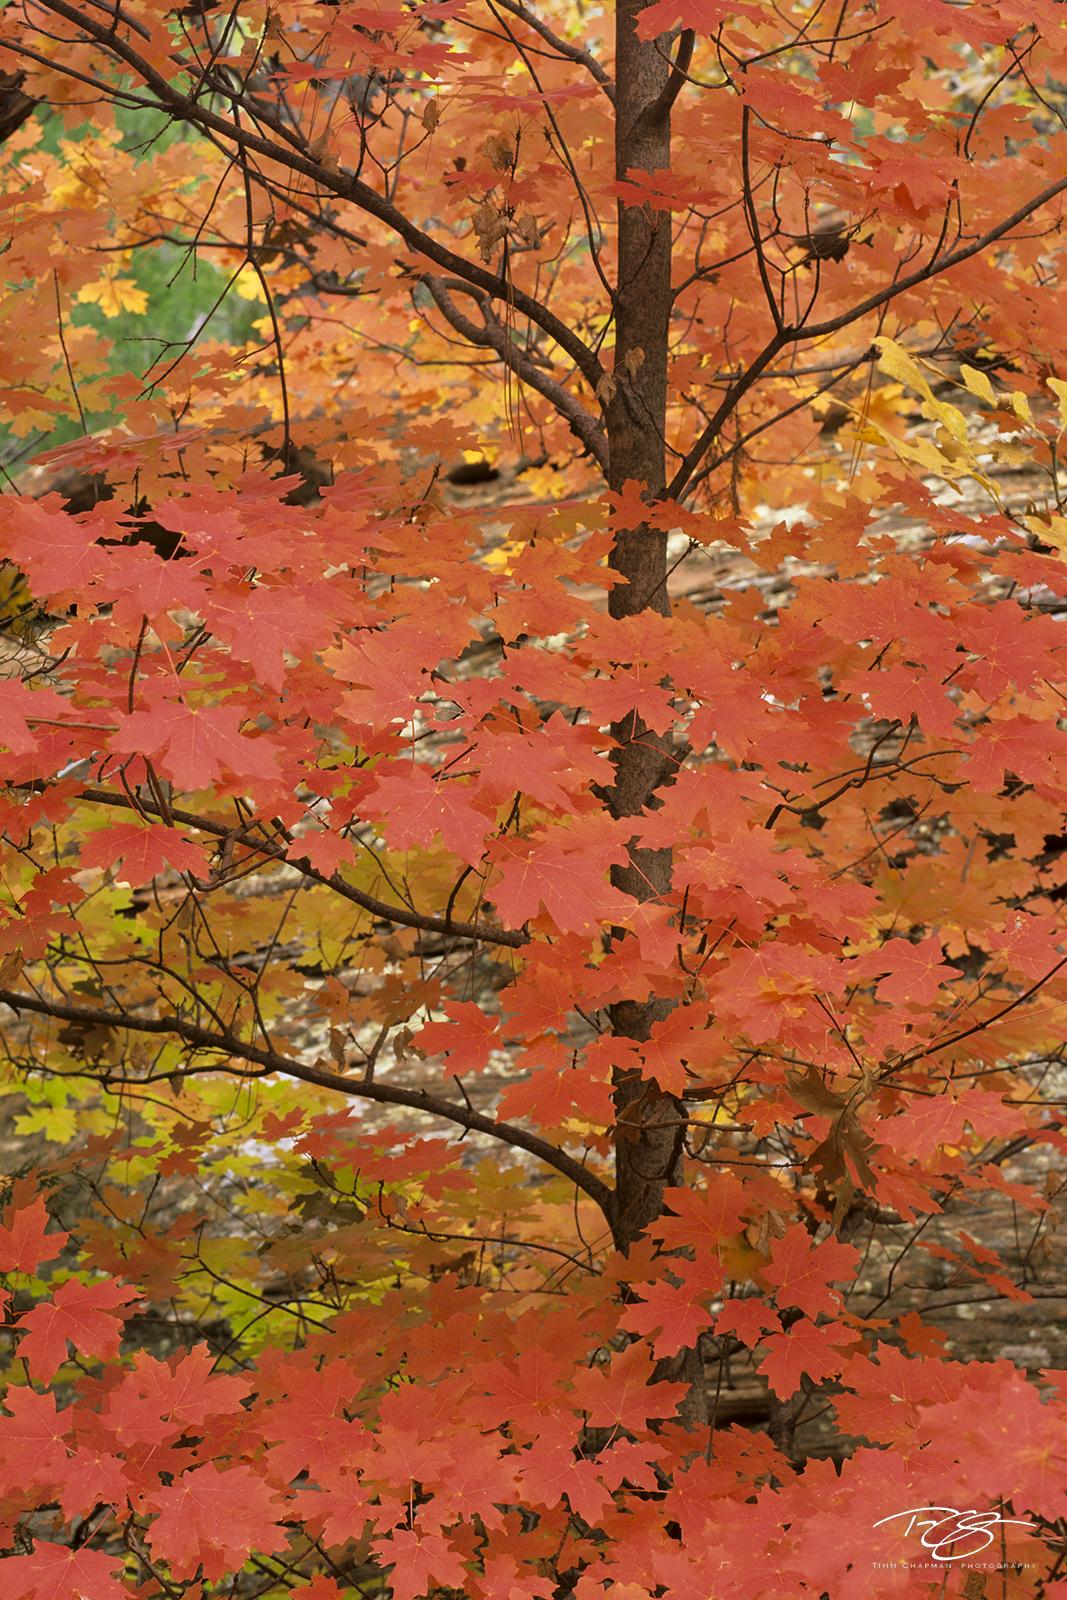 arizona, autumn, autumn color, autumn colour, fall color, fall colour, leaves, salmon, pink, red, bigtooth maple, maple tree, tree, arizona, hospital canyon, west fork, oak creek, sedona, red rocks, photo